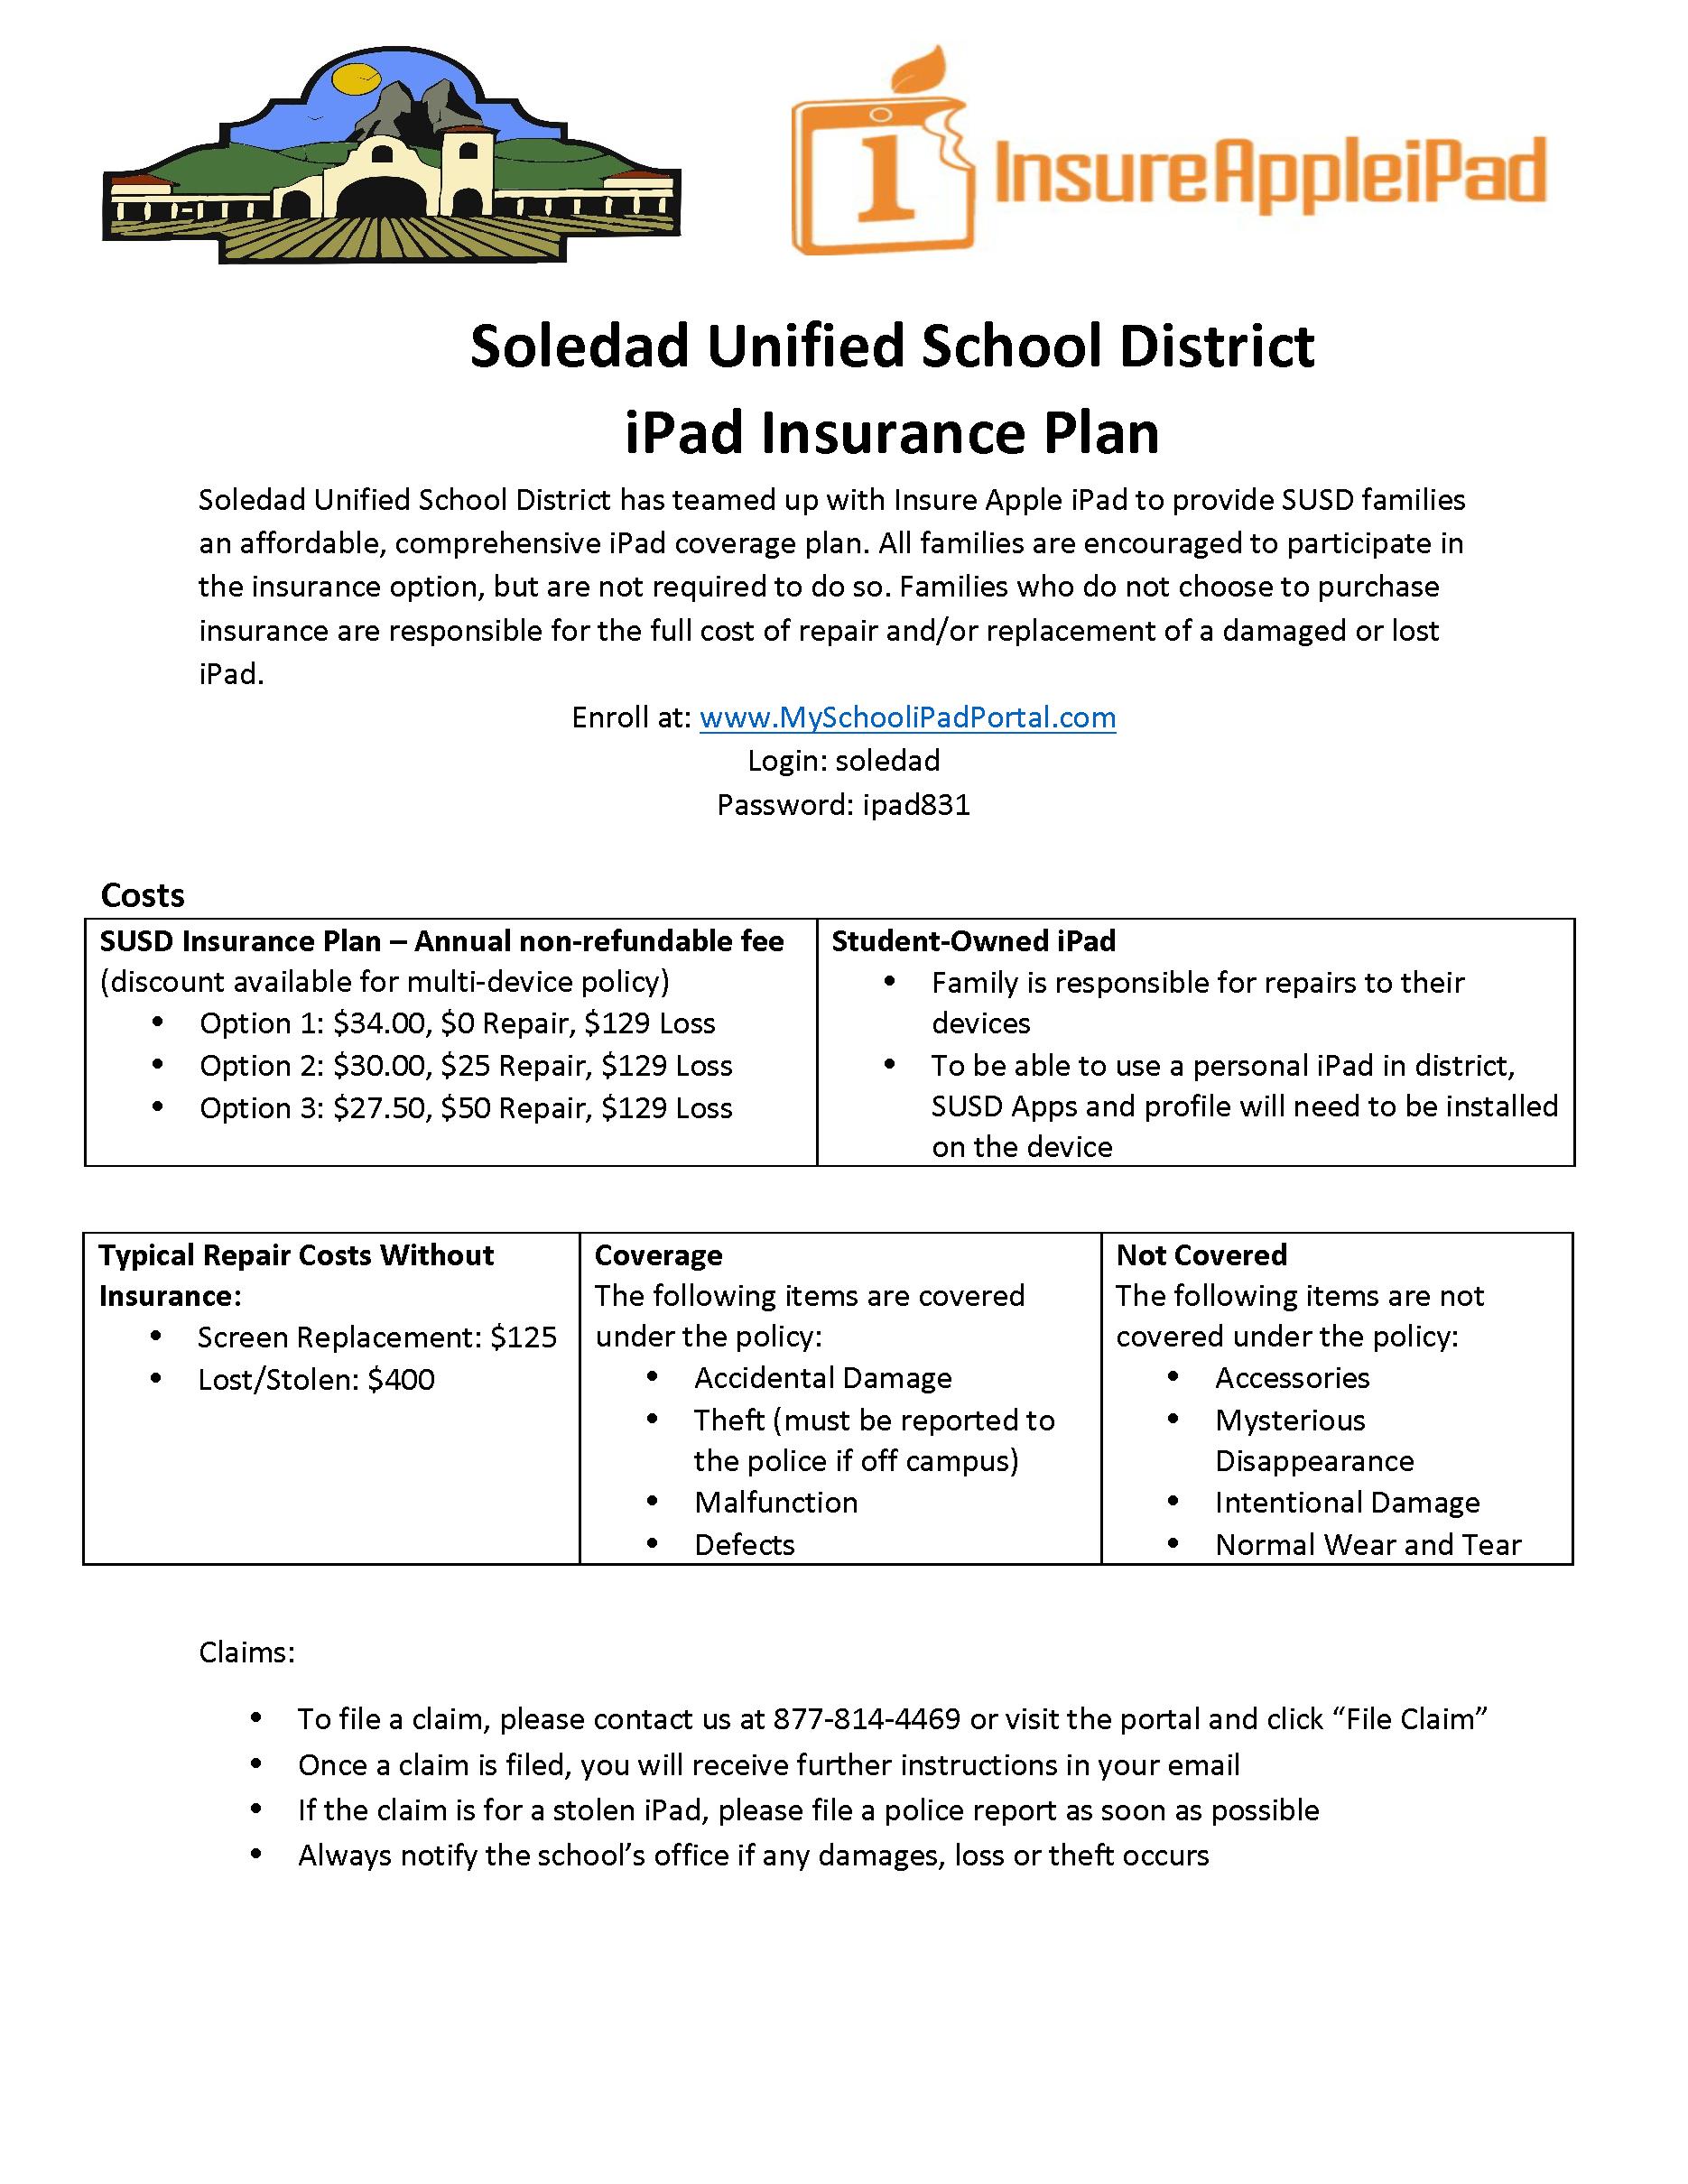 Soledad Unified School District Form (2)